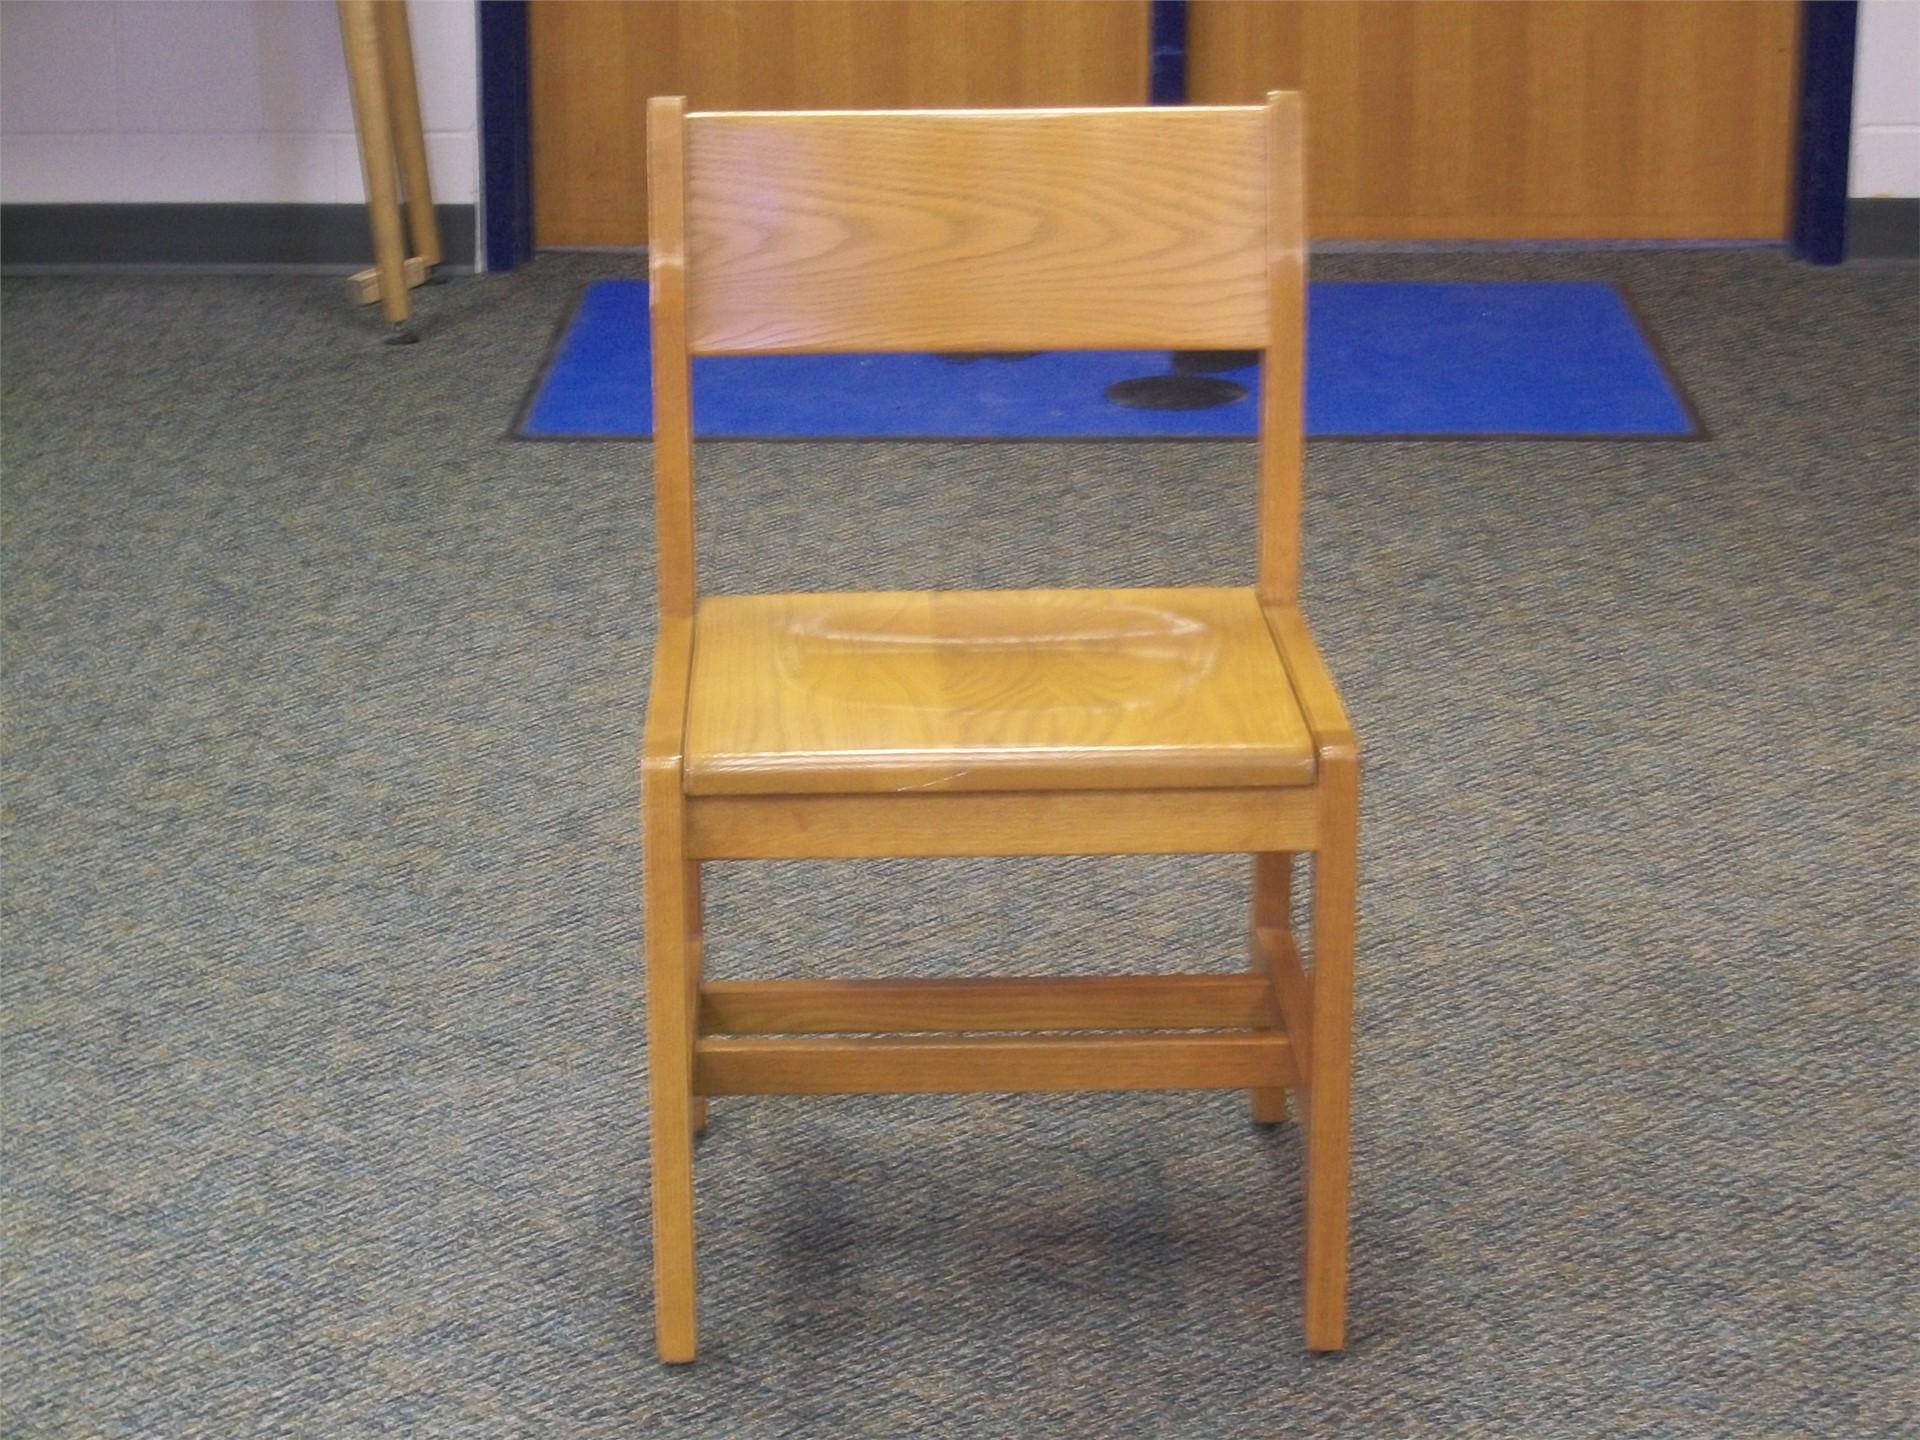 Group Improv Chair